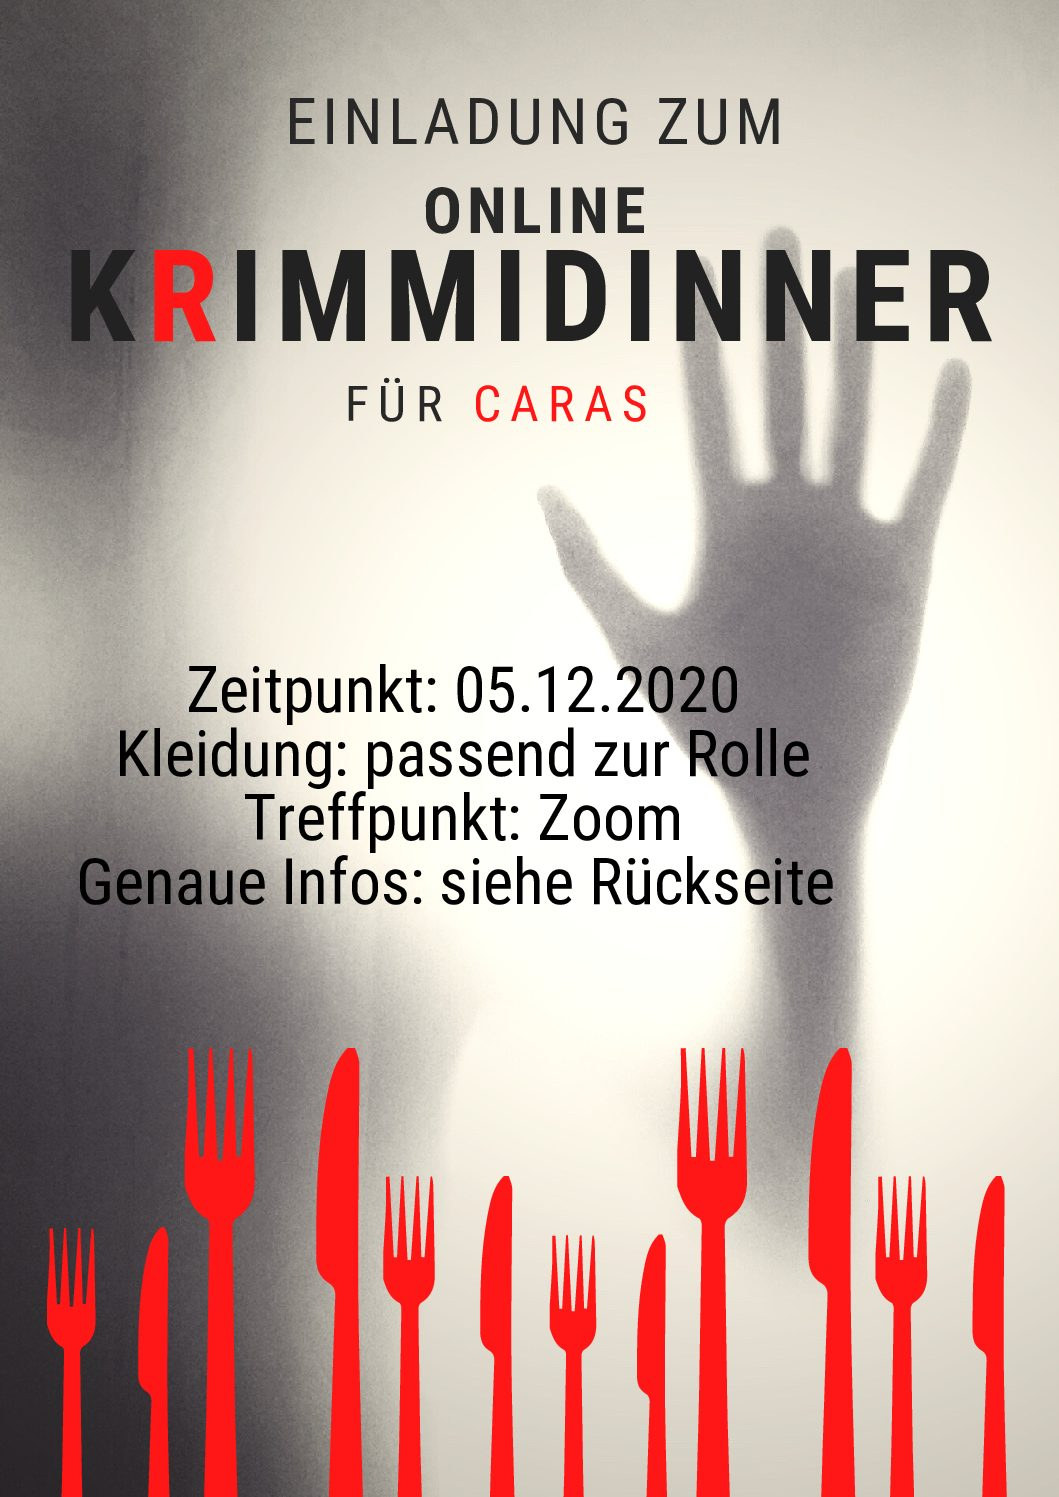 Krimidinner für Caras | 05.12.2020